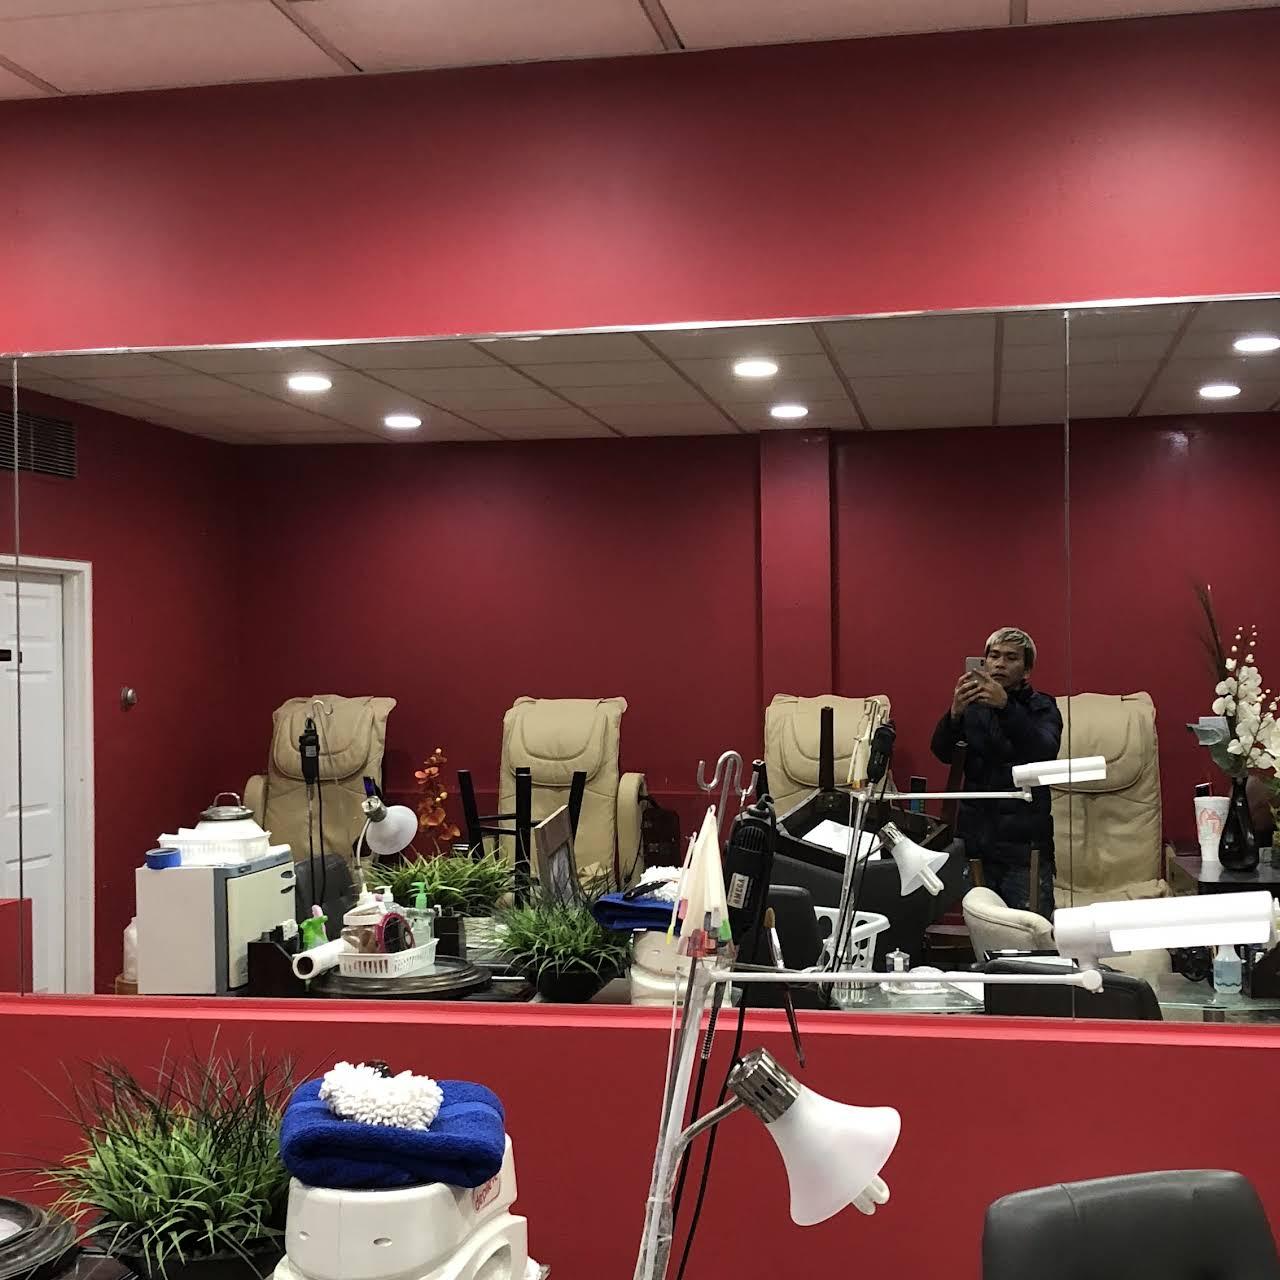 Q Nails - Nail Salon in Roanoke